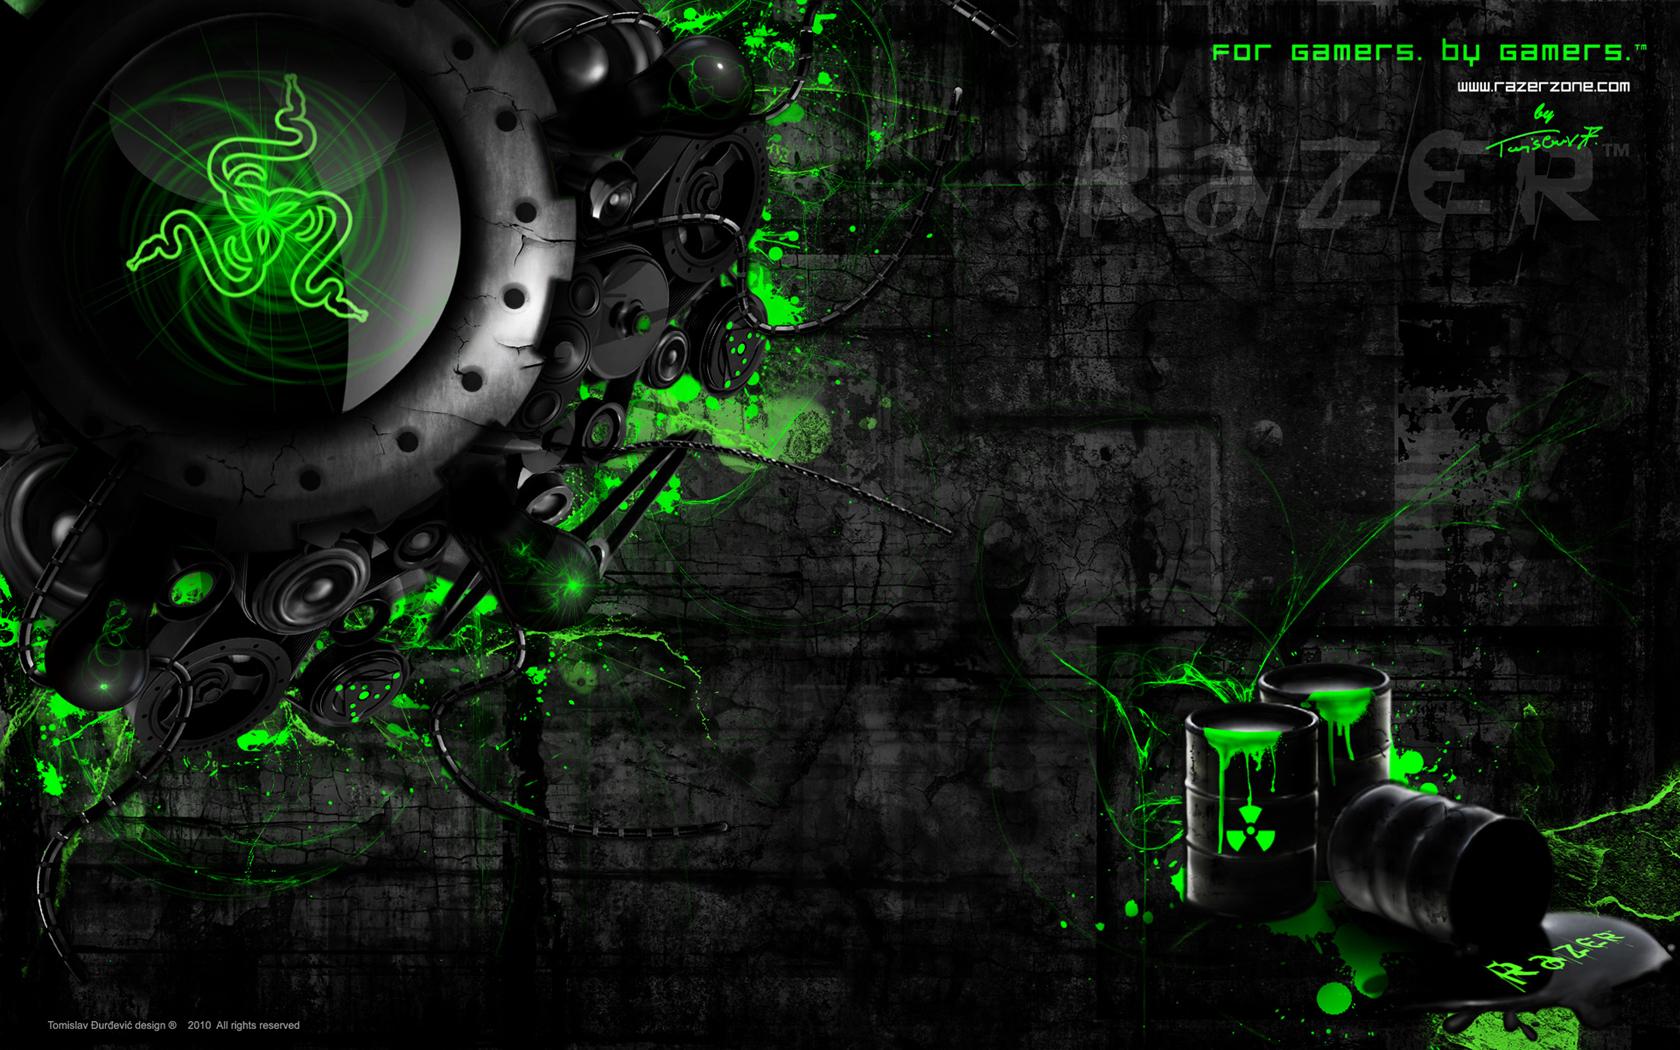 Razer Abstract Wallpaper Best HD Wallpapers 1680x1050